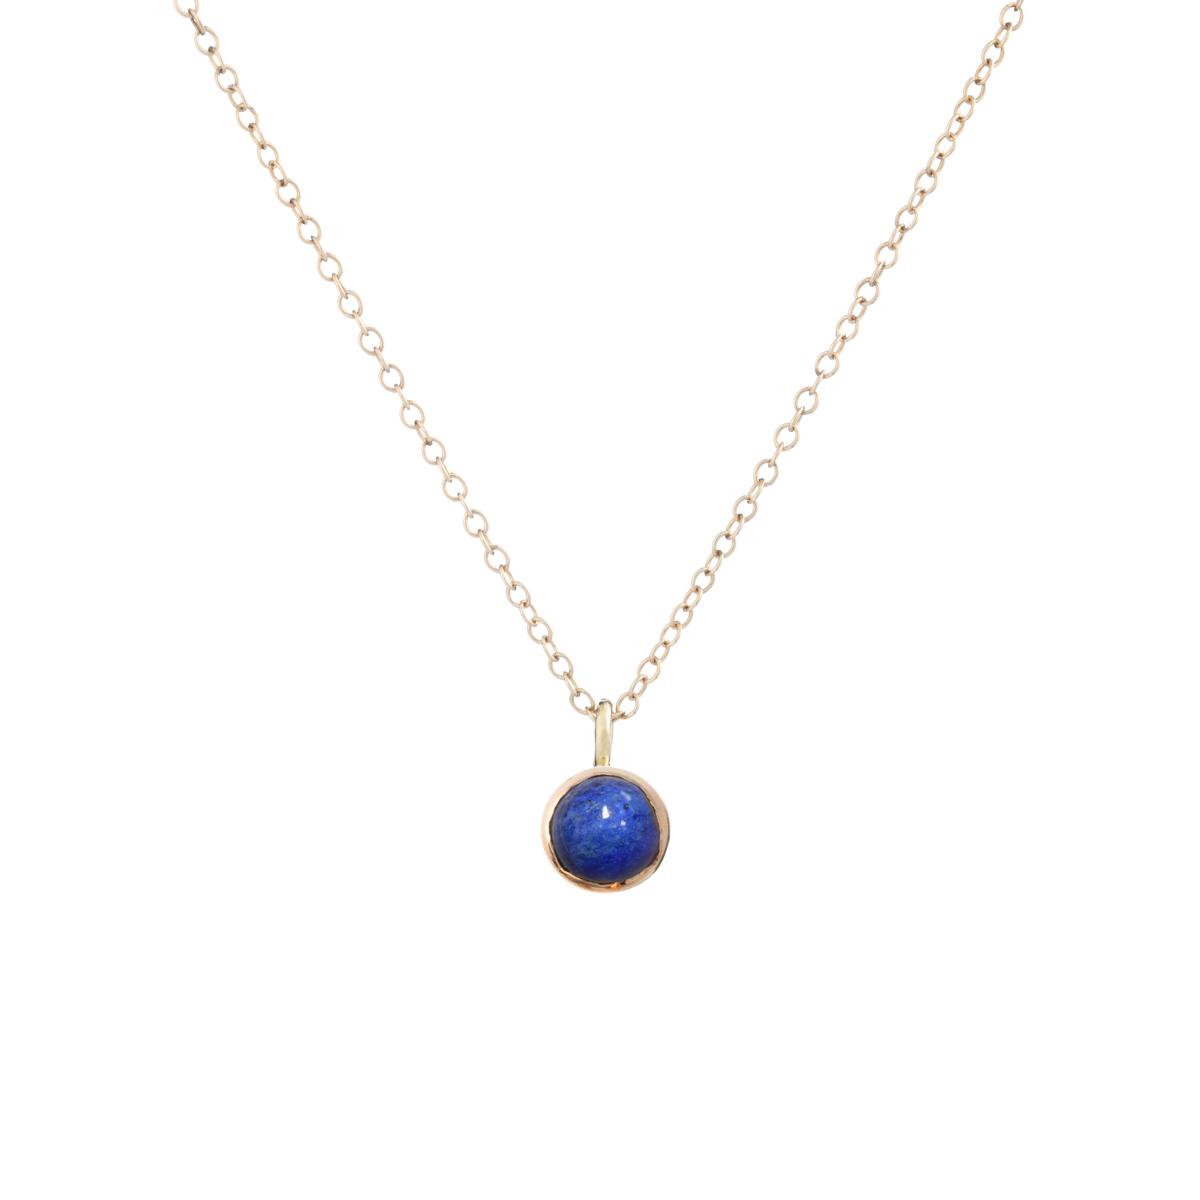 Blossom pendant with lapis lazuli